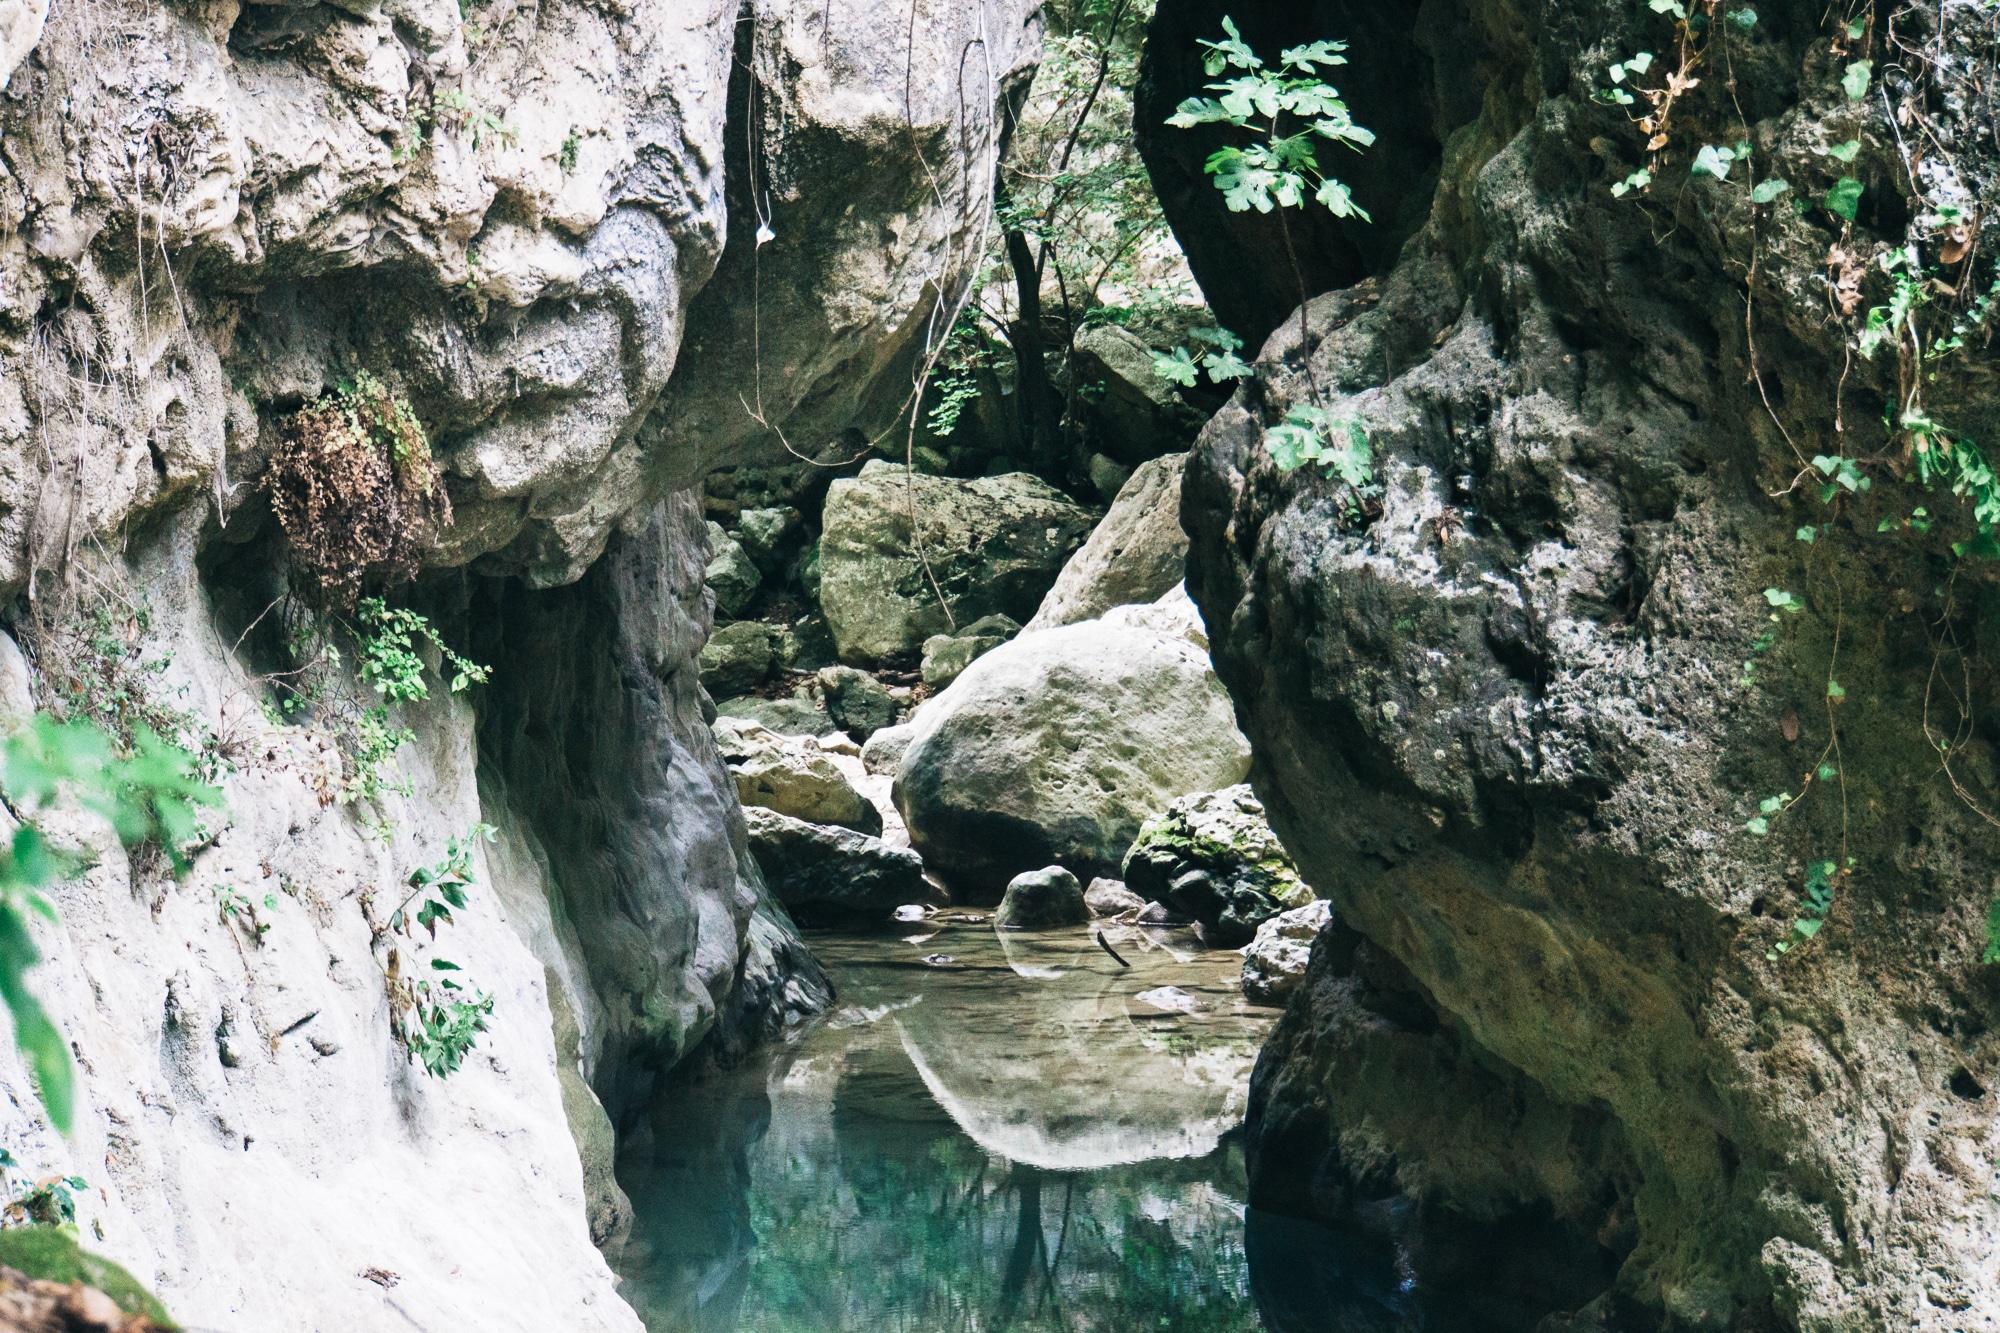 Dimosari Wasserfall, Lefkada, Griechenland